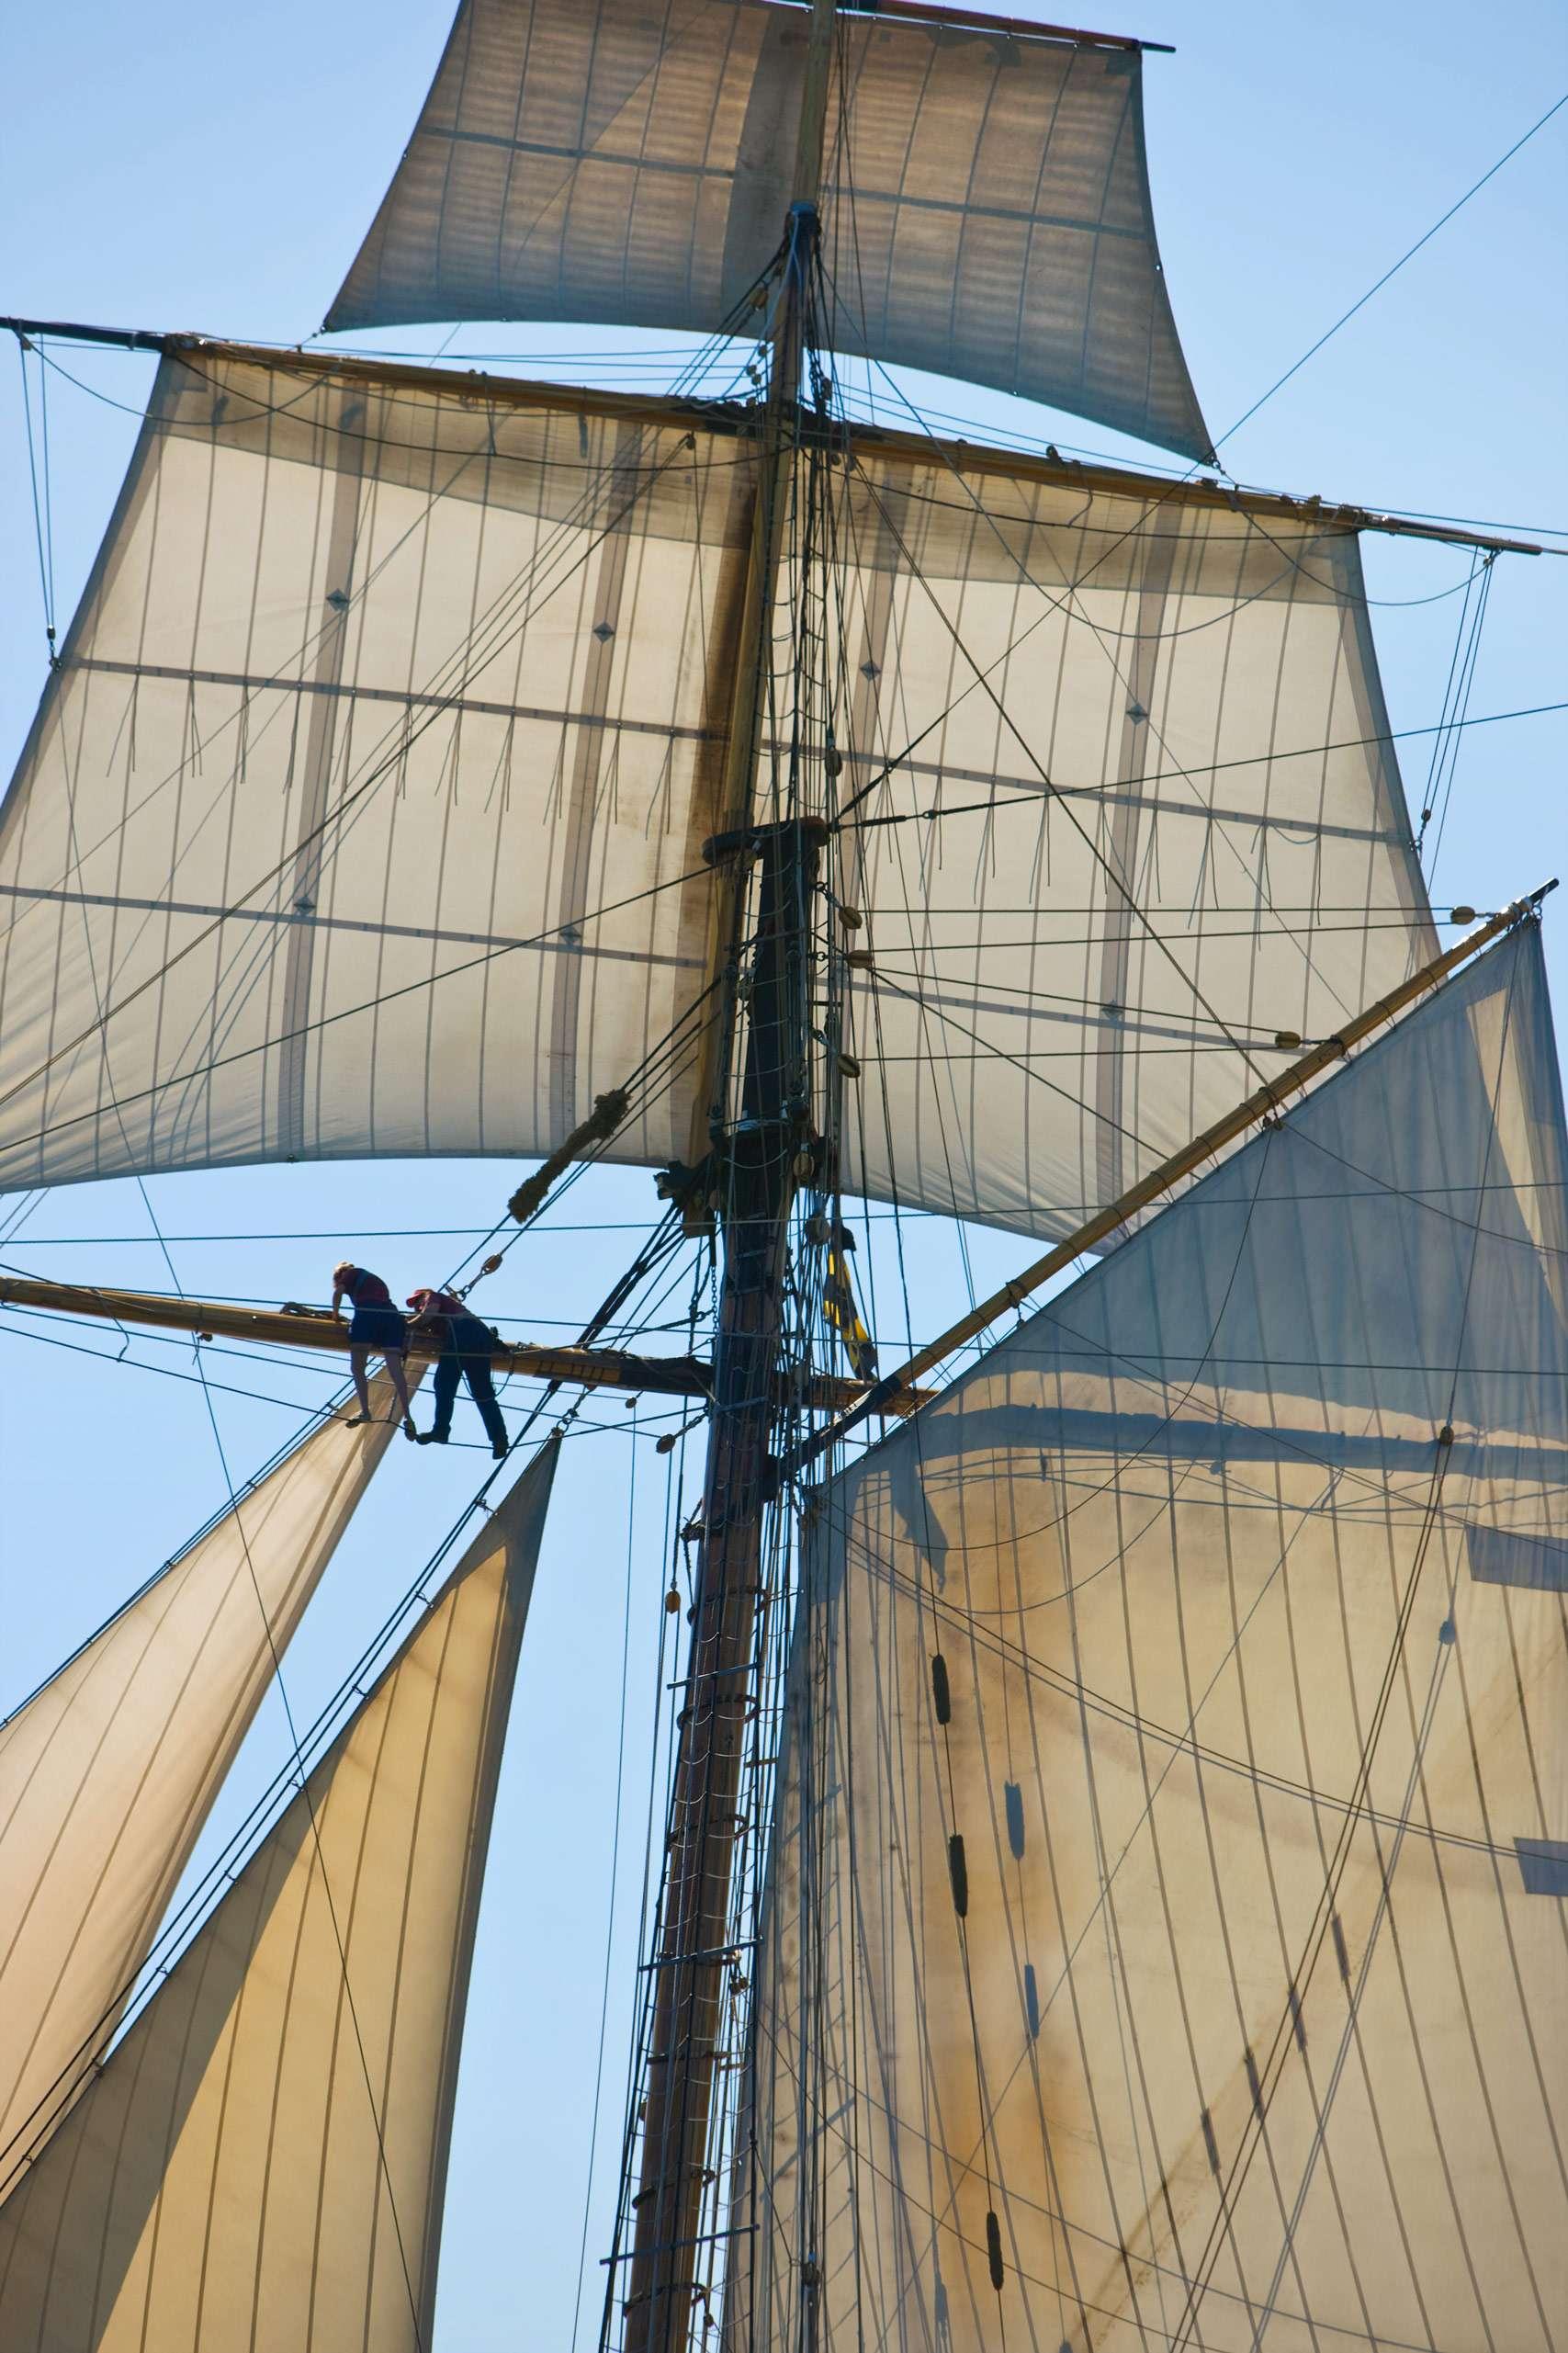 PORTFOLIO - Sailing - Windjammers #6   PCG457